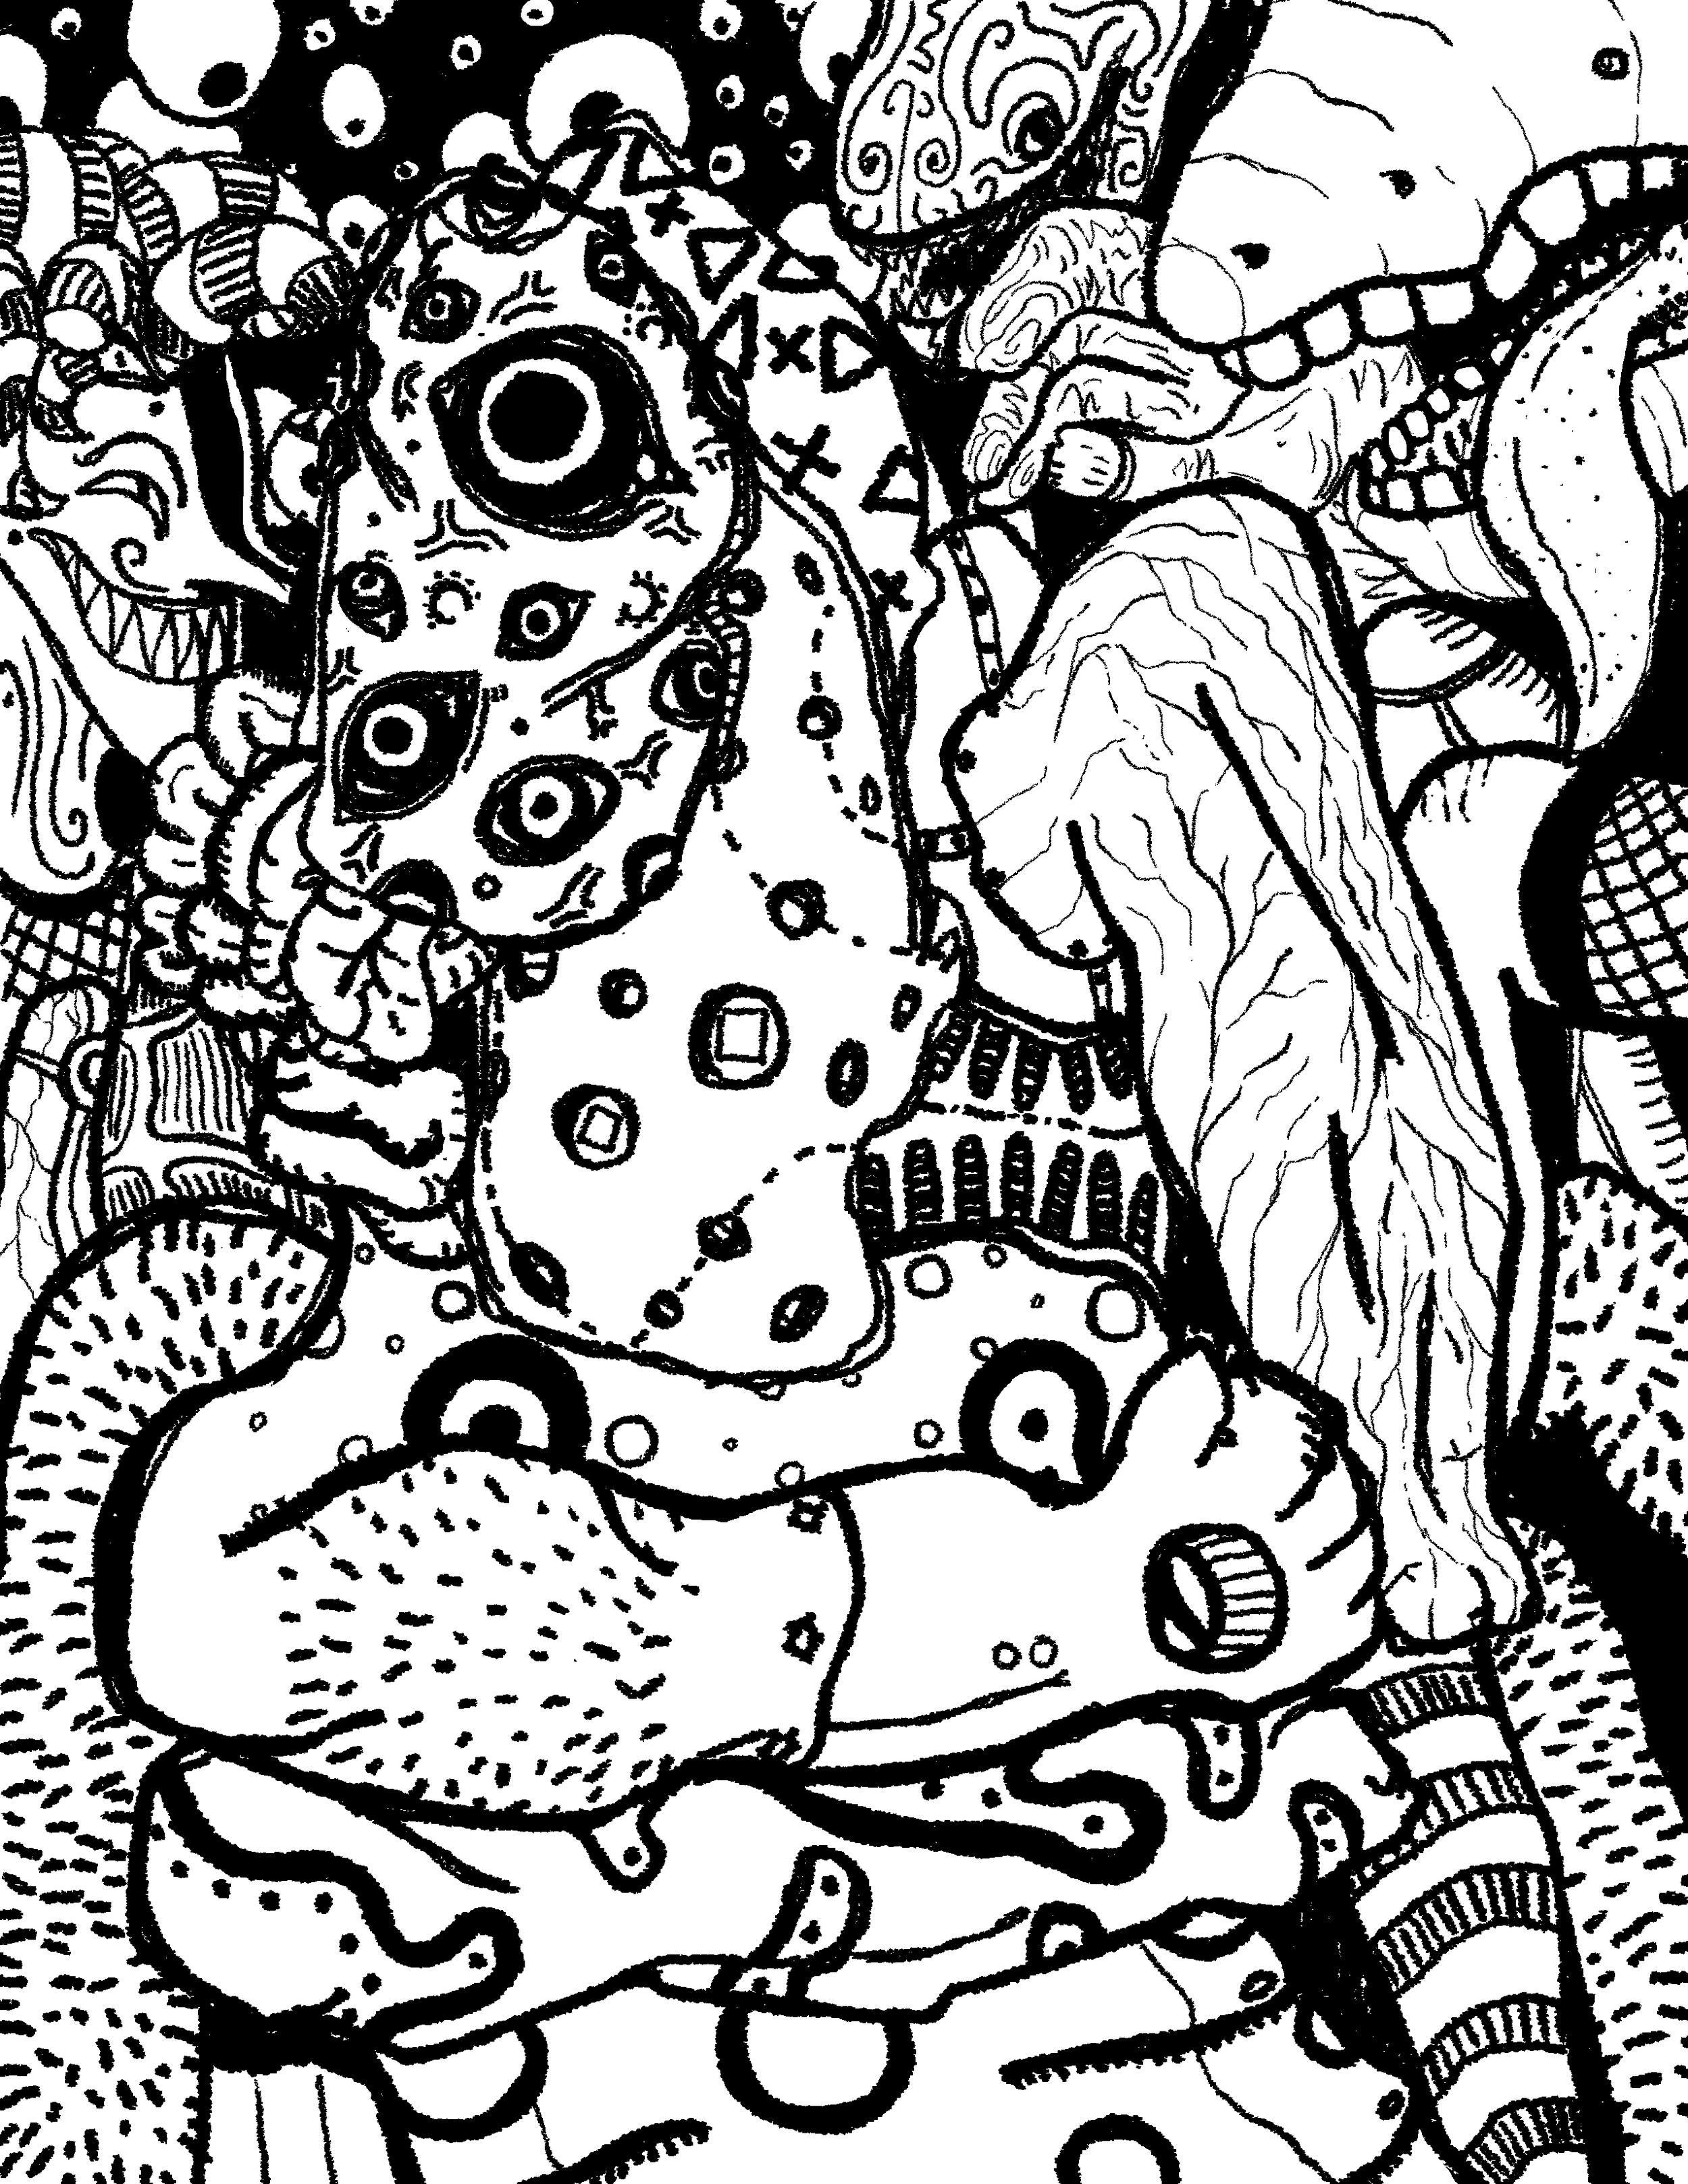 Schizophrenia - Digital Art - 2015